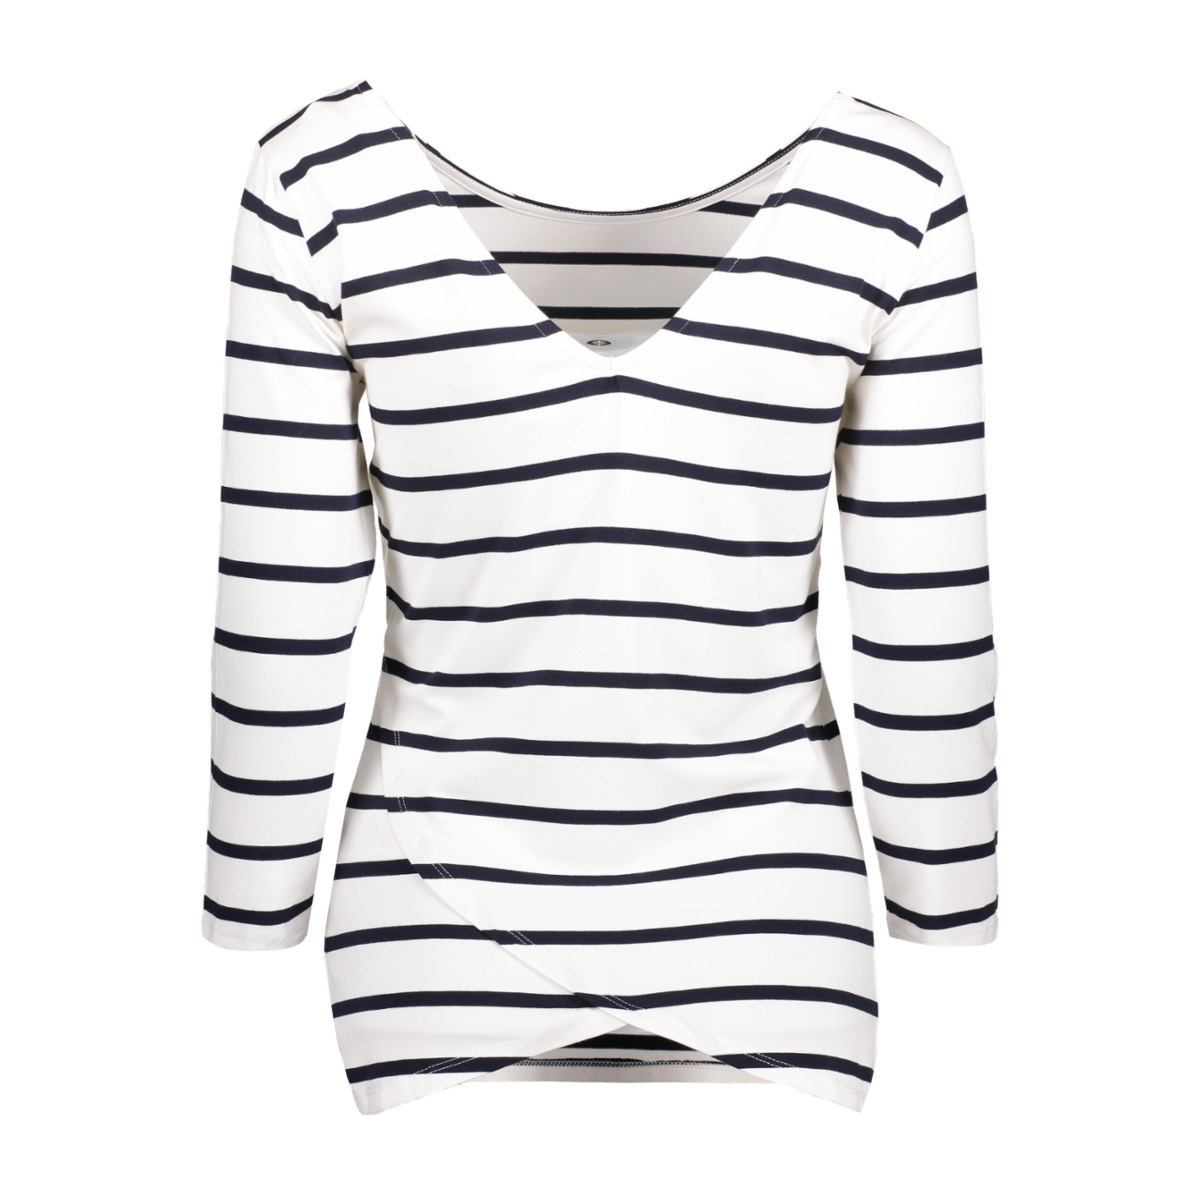 objelona wrap 3/4 top noos 23023663 object t-shirt white